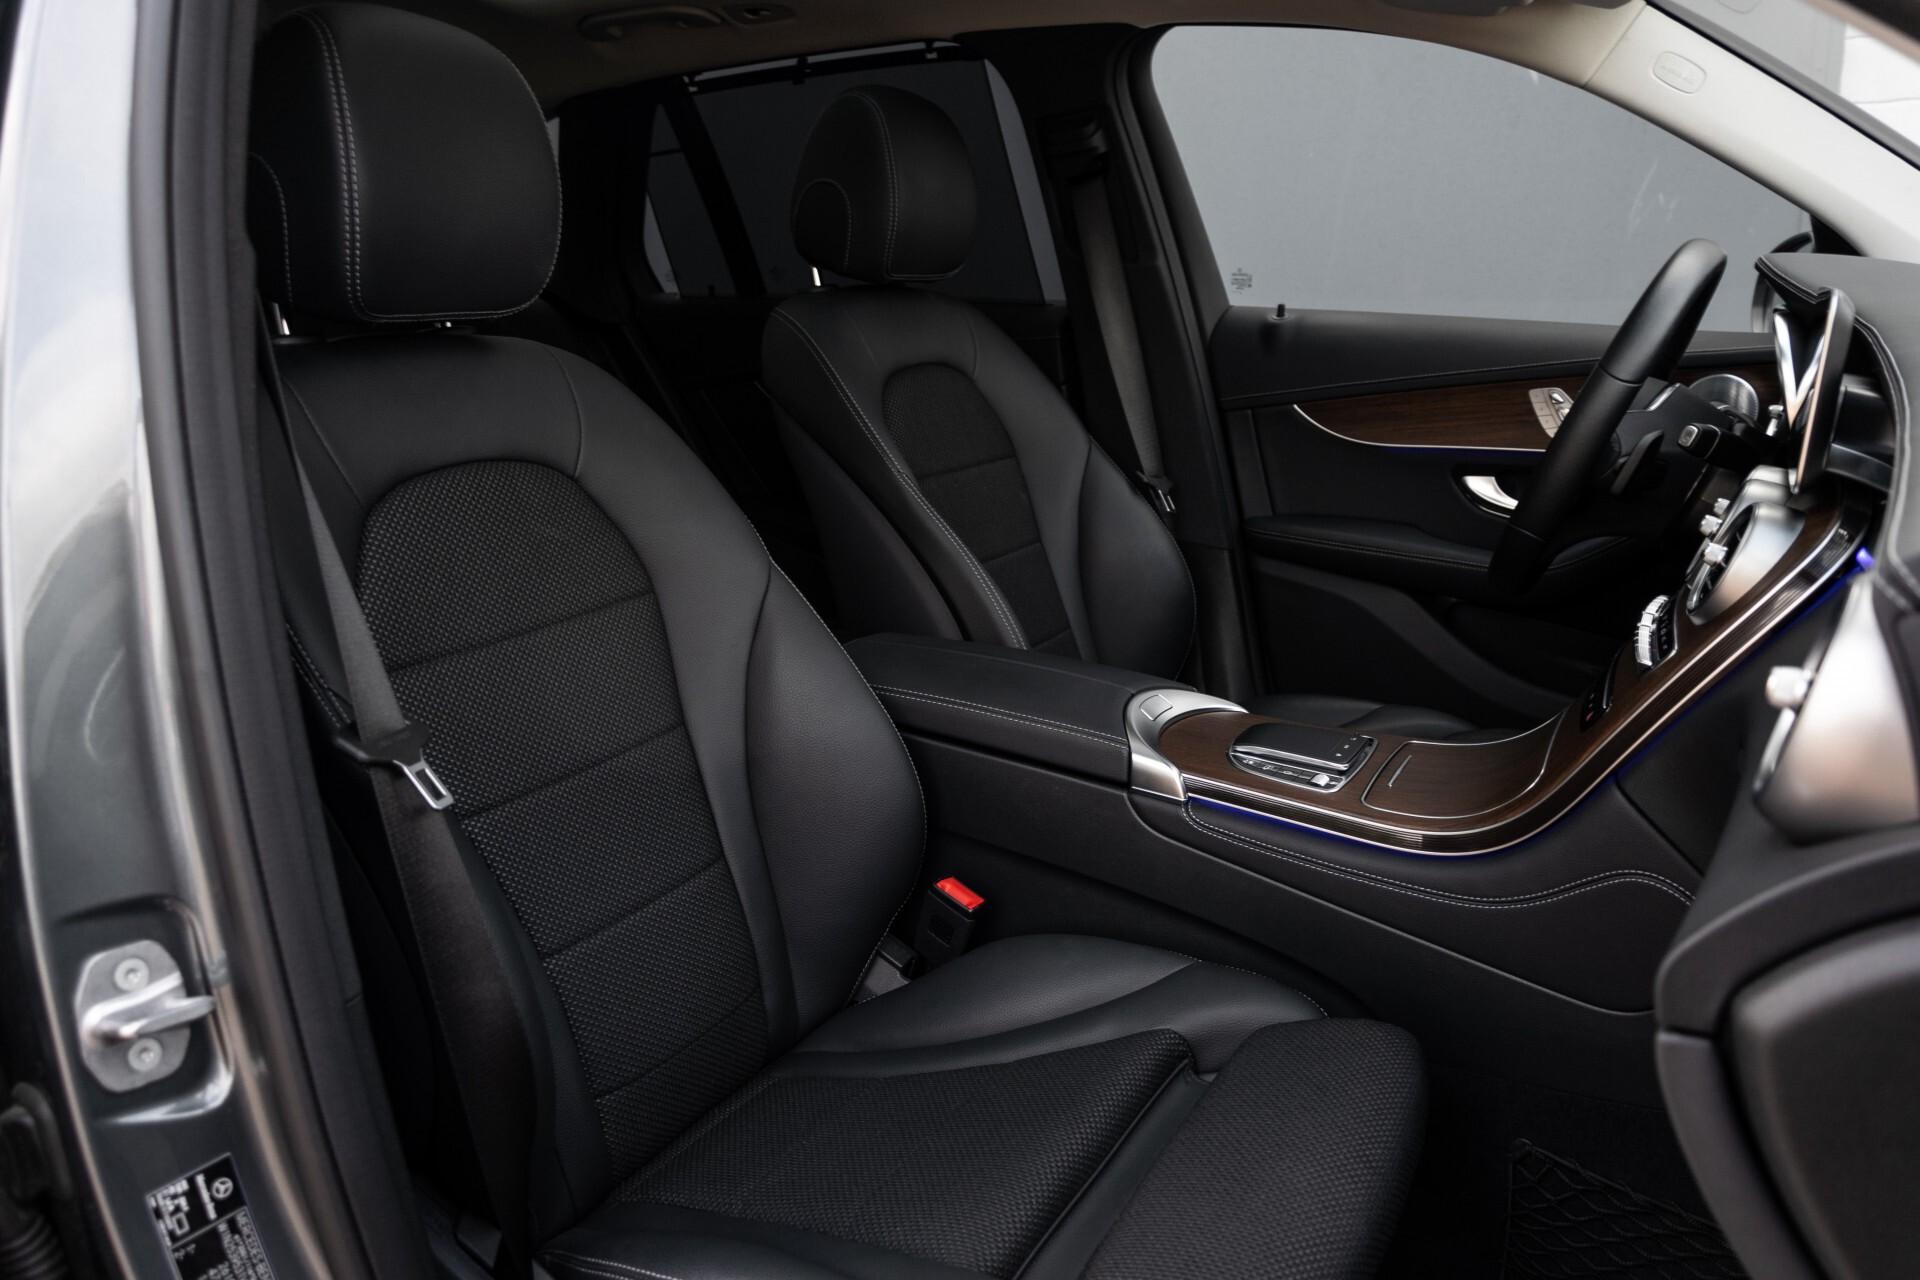 Mercedes-Benz GLC 300e 4-M Luchtvering/Panorama/Multicontourstoelen/Rij-assistentie/Standkachel Aut9 Foto 4